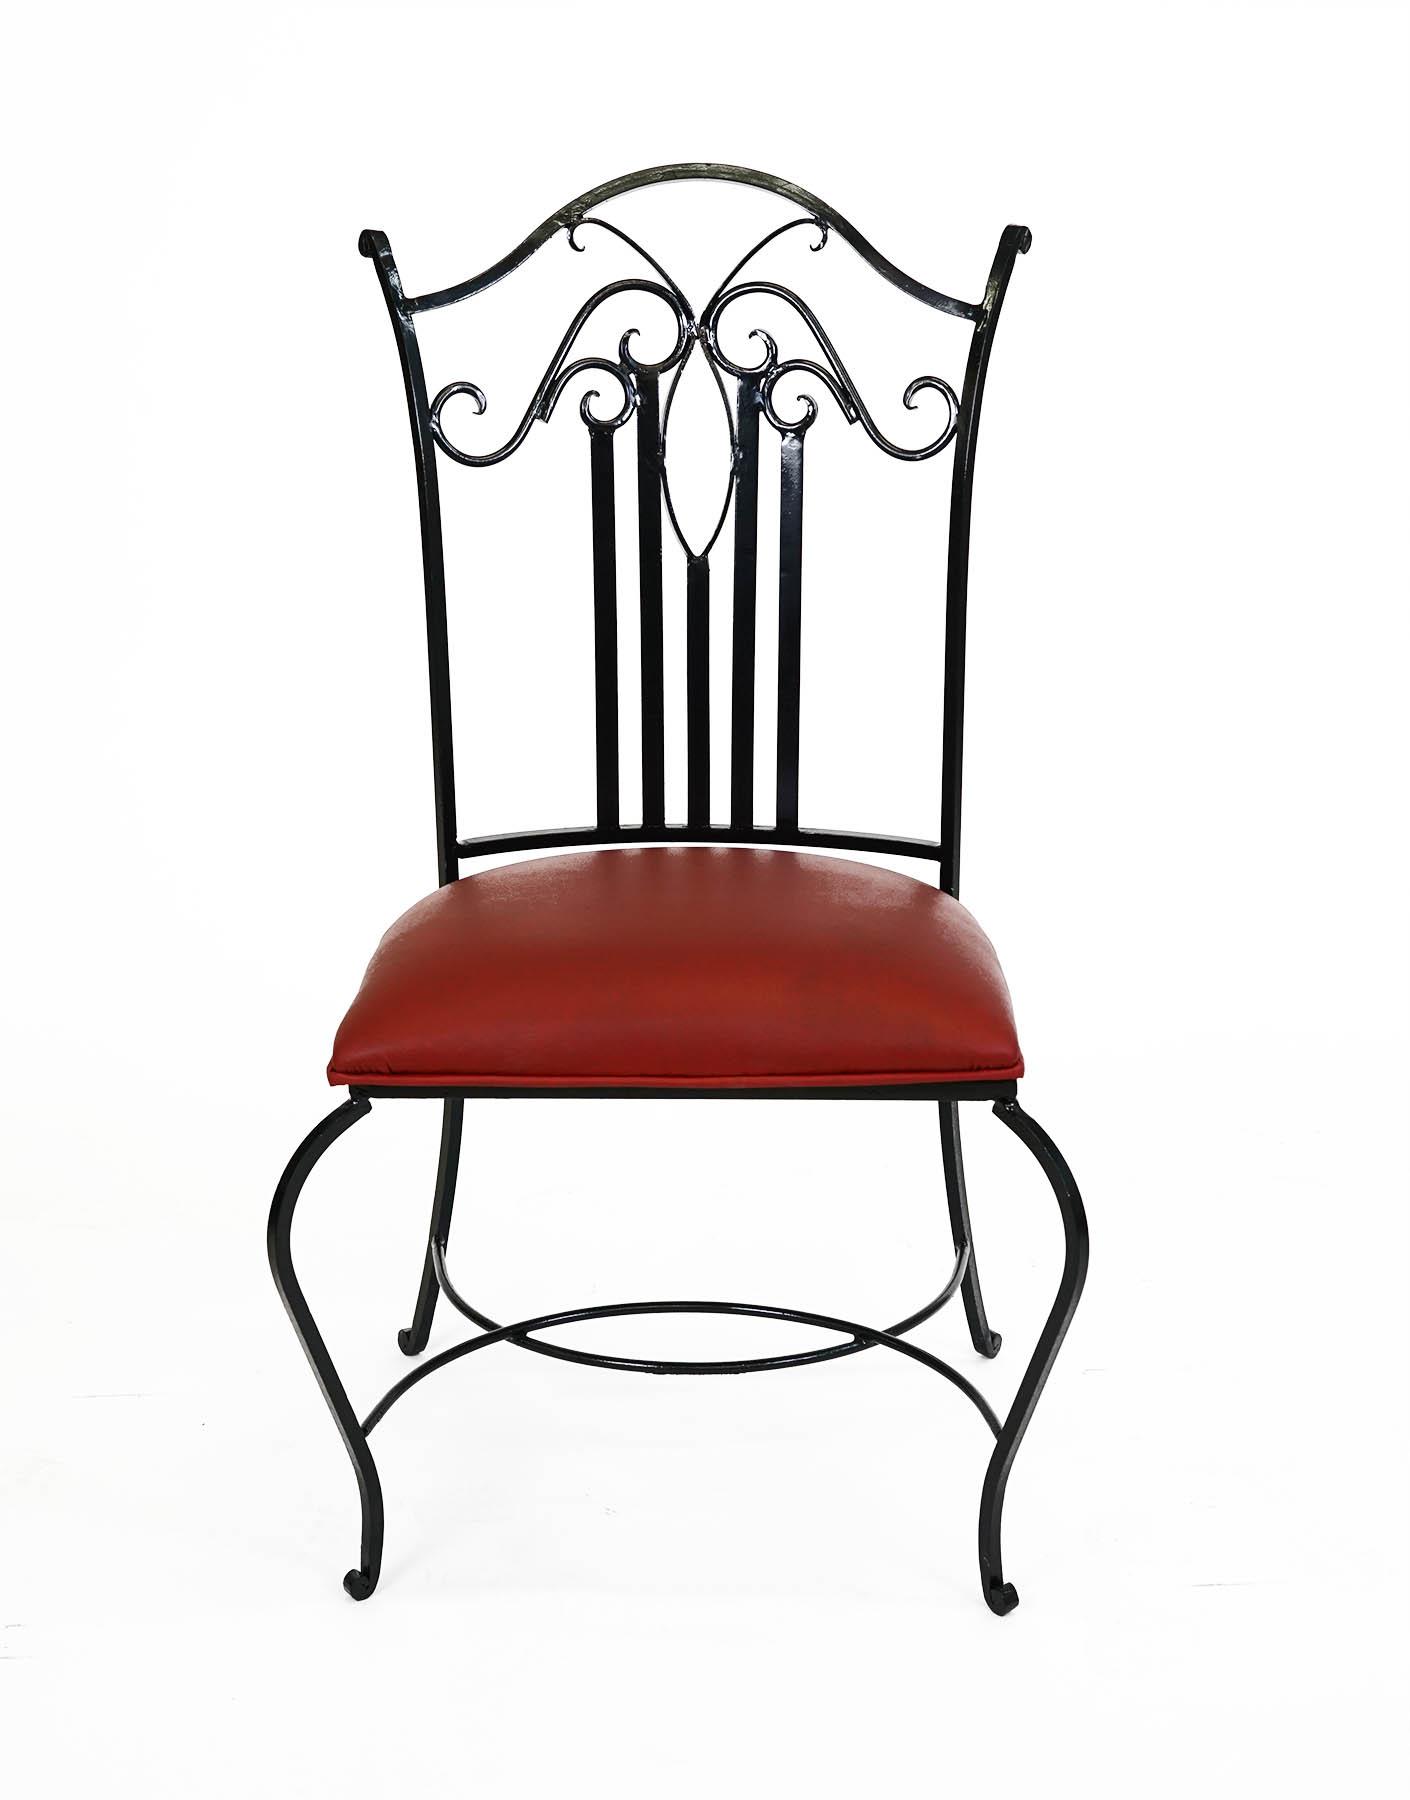 Dream Furniture Catalog Photo 0003.jpg